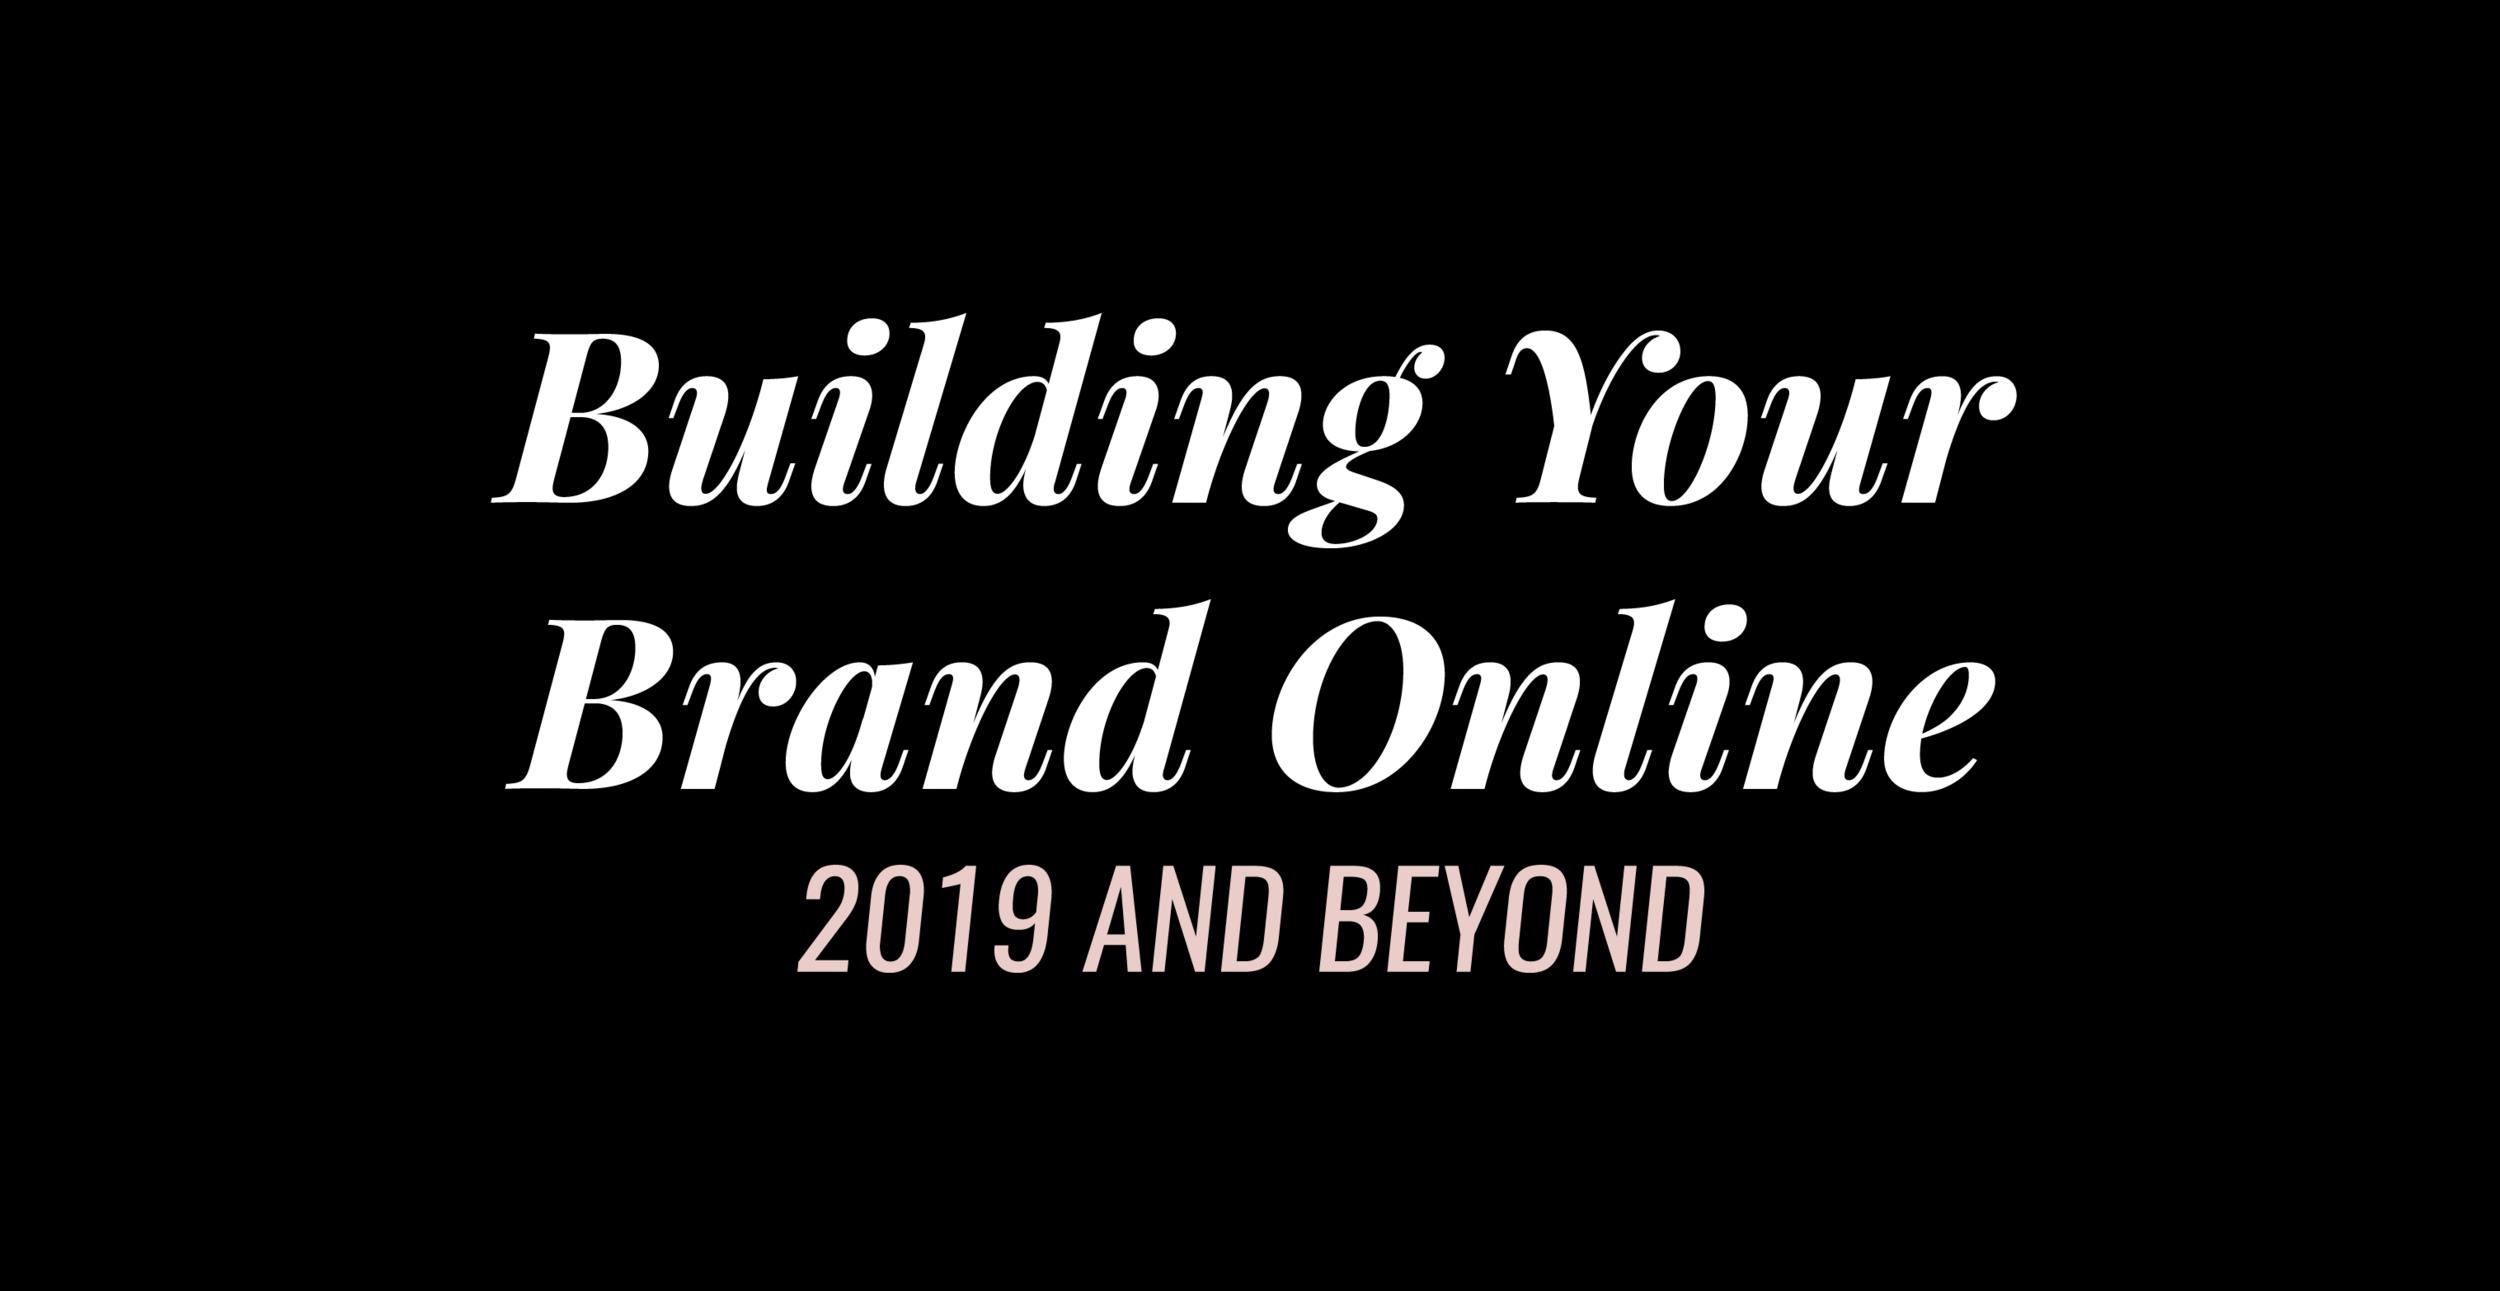 Building Your Brand Online 2019 And Beyond Branding Queen Cassia Marina The Girl Boss Empire Kristen Alexis Jason Marcano Paperclip Media Keron Rose Driod Island